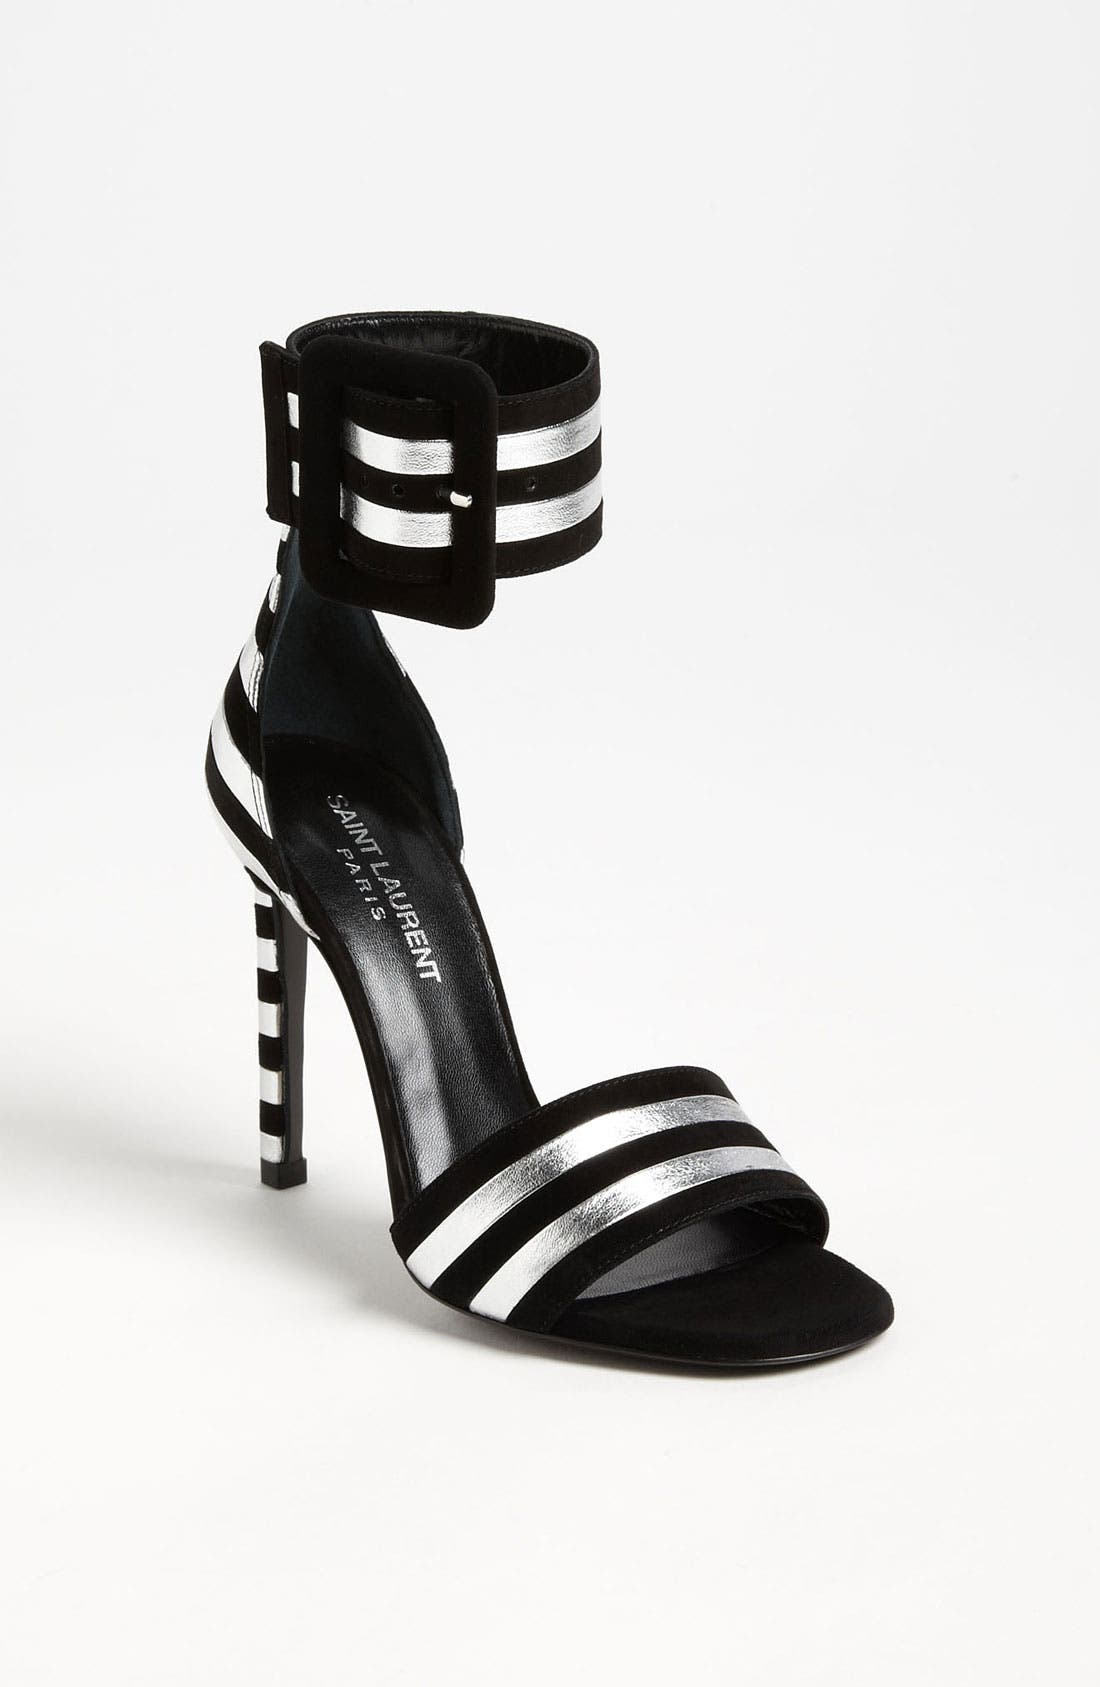 Alternate Image 1 Selected - Saint Laurent 'Paloma' Sandal